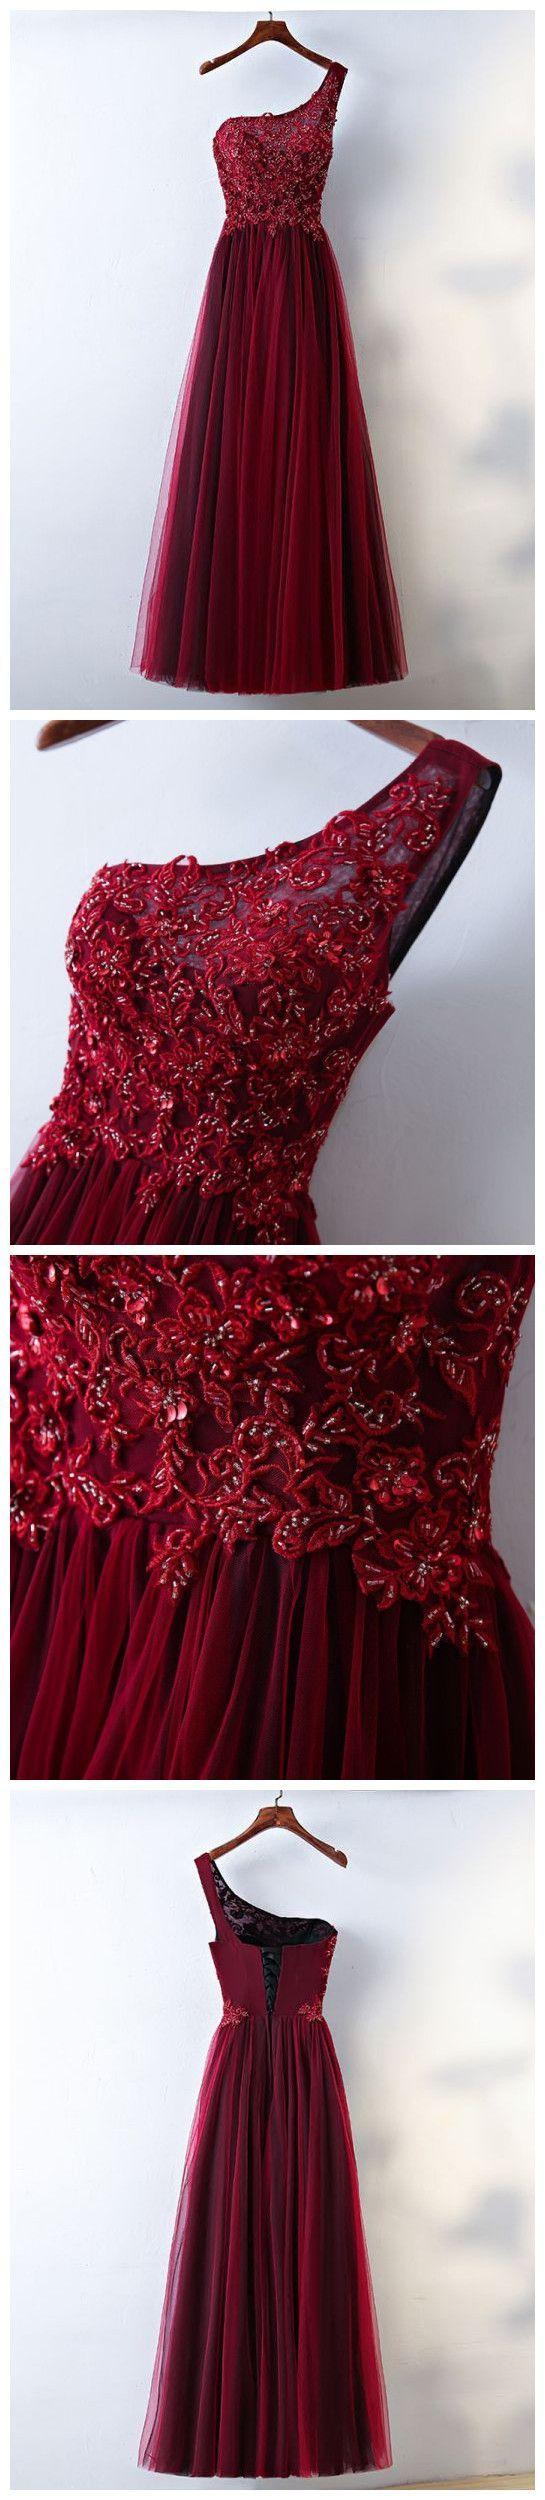 Chic aline one shoulder tulle modest burgundy long prom dress